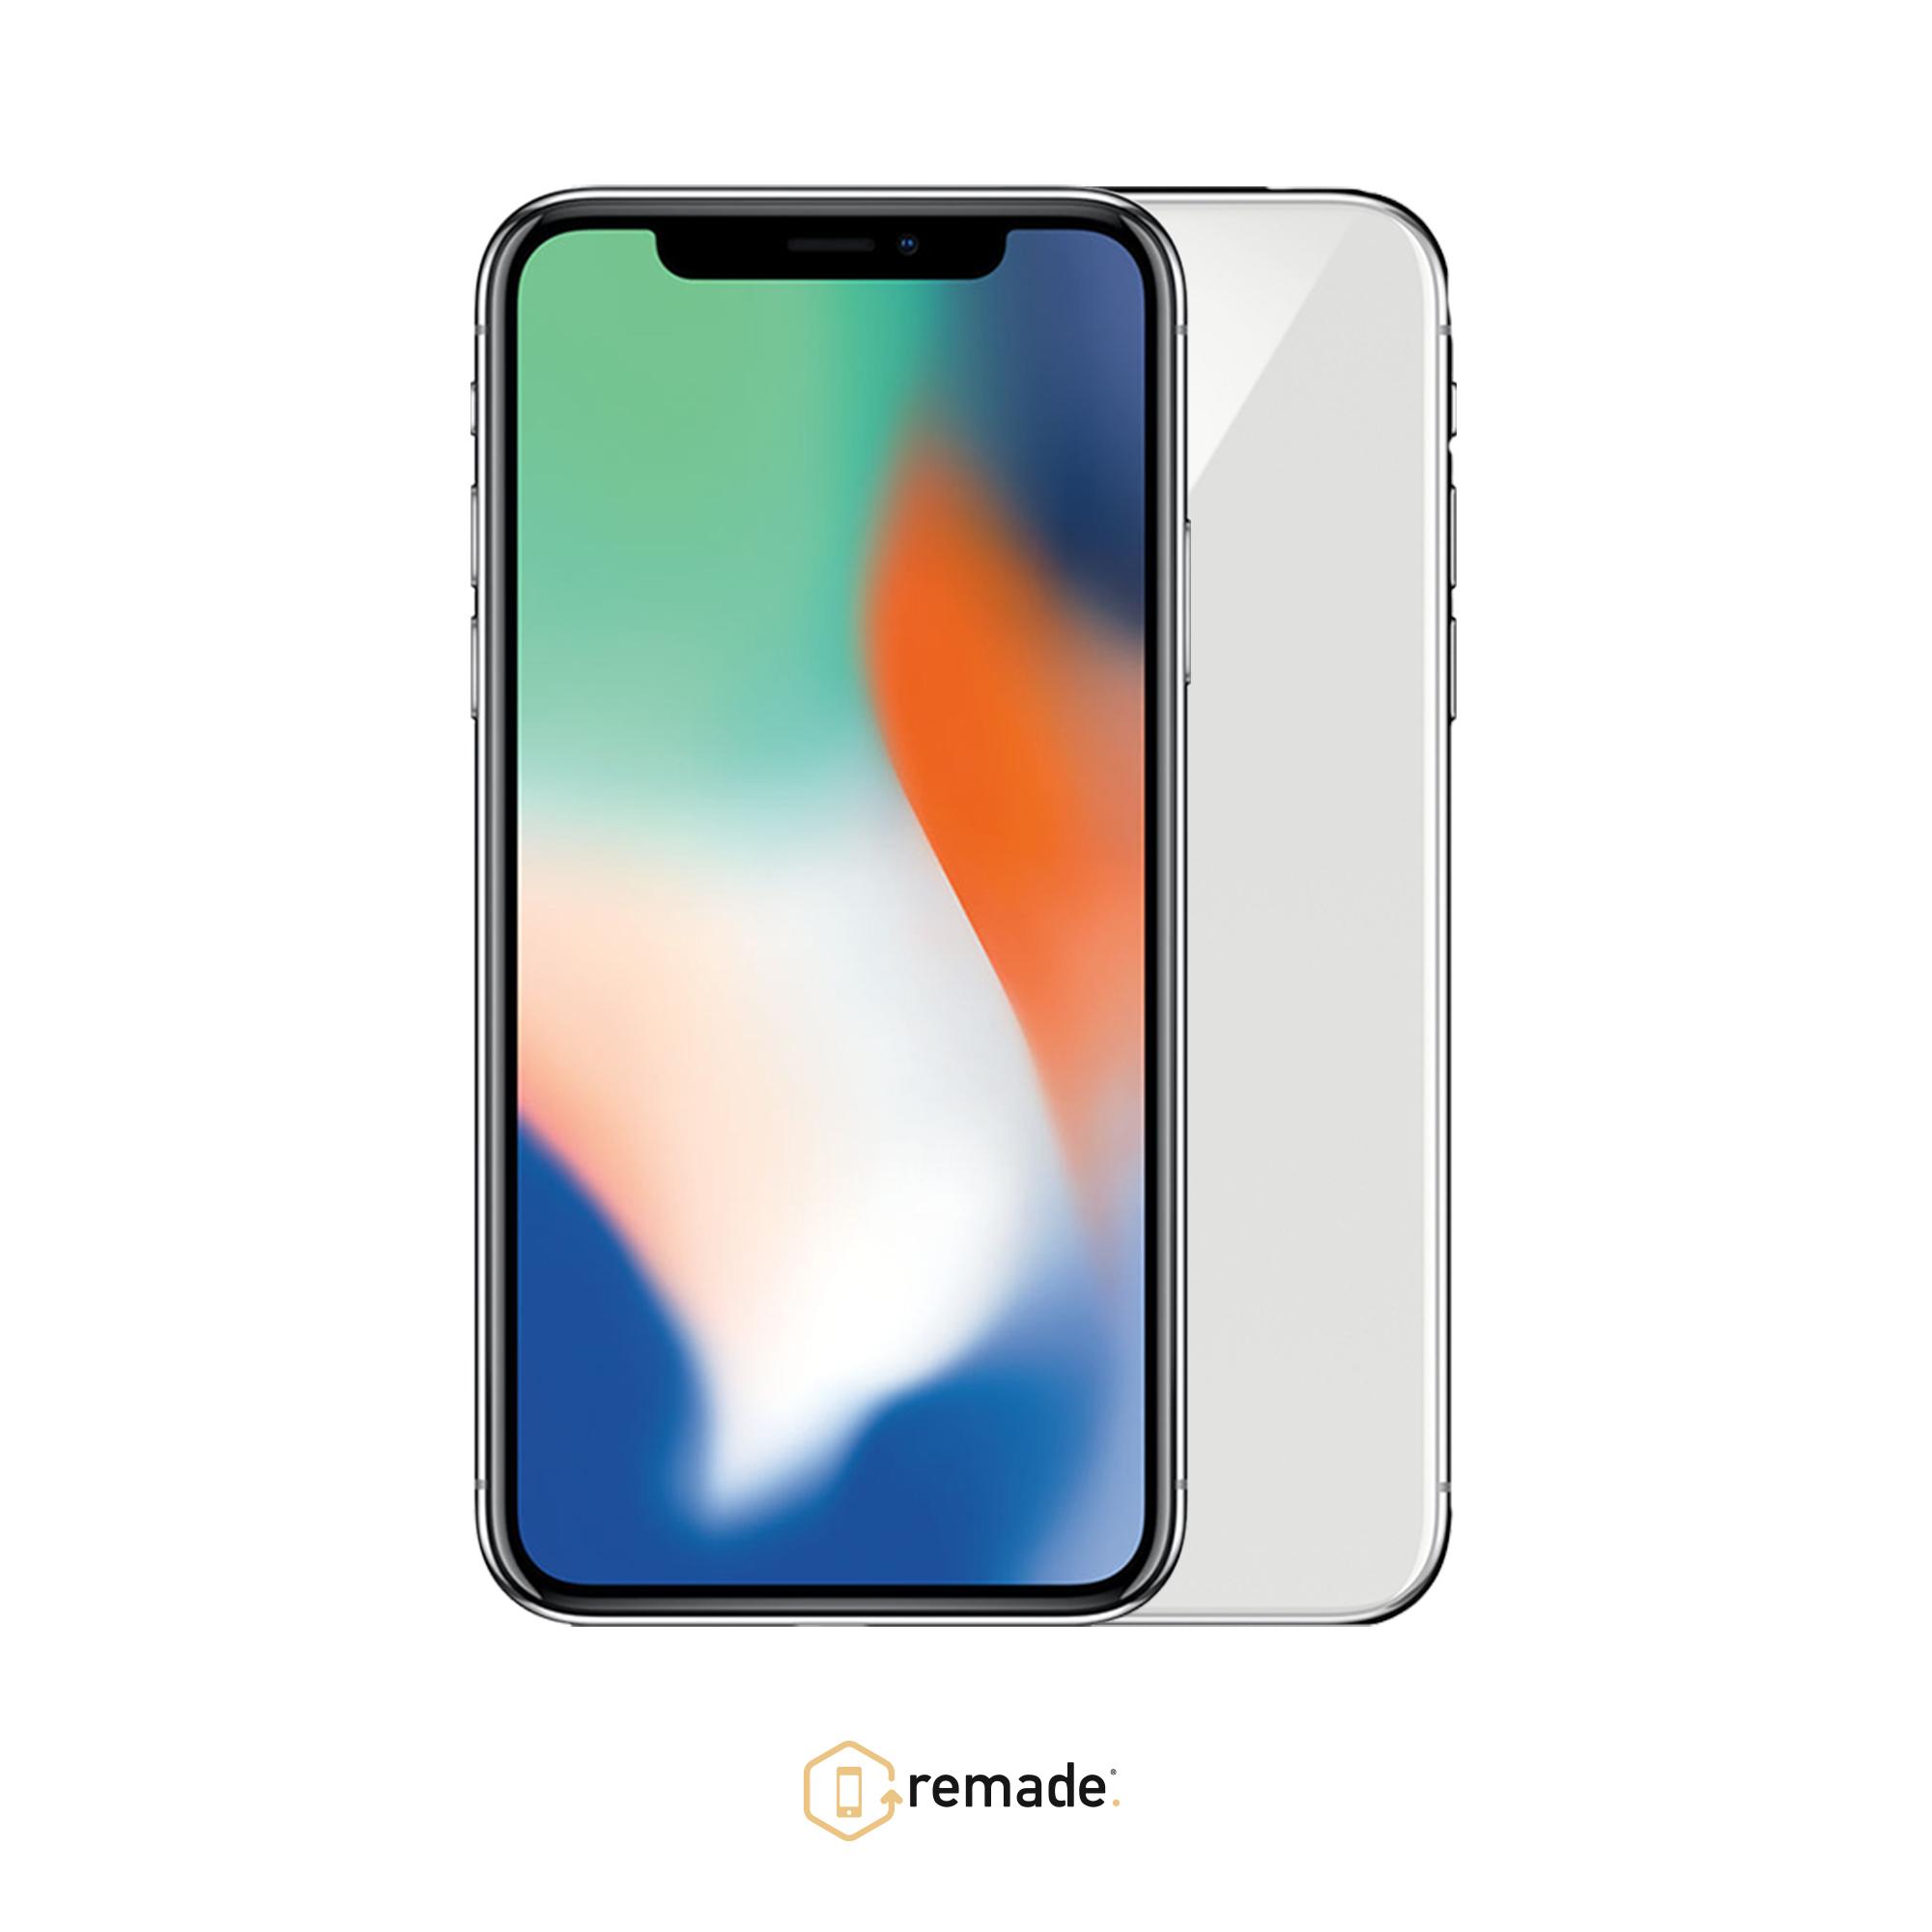 Mobilni telefon Remade Iphone X, 64 GB, srebrna